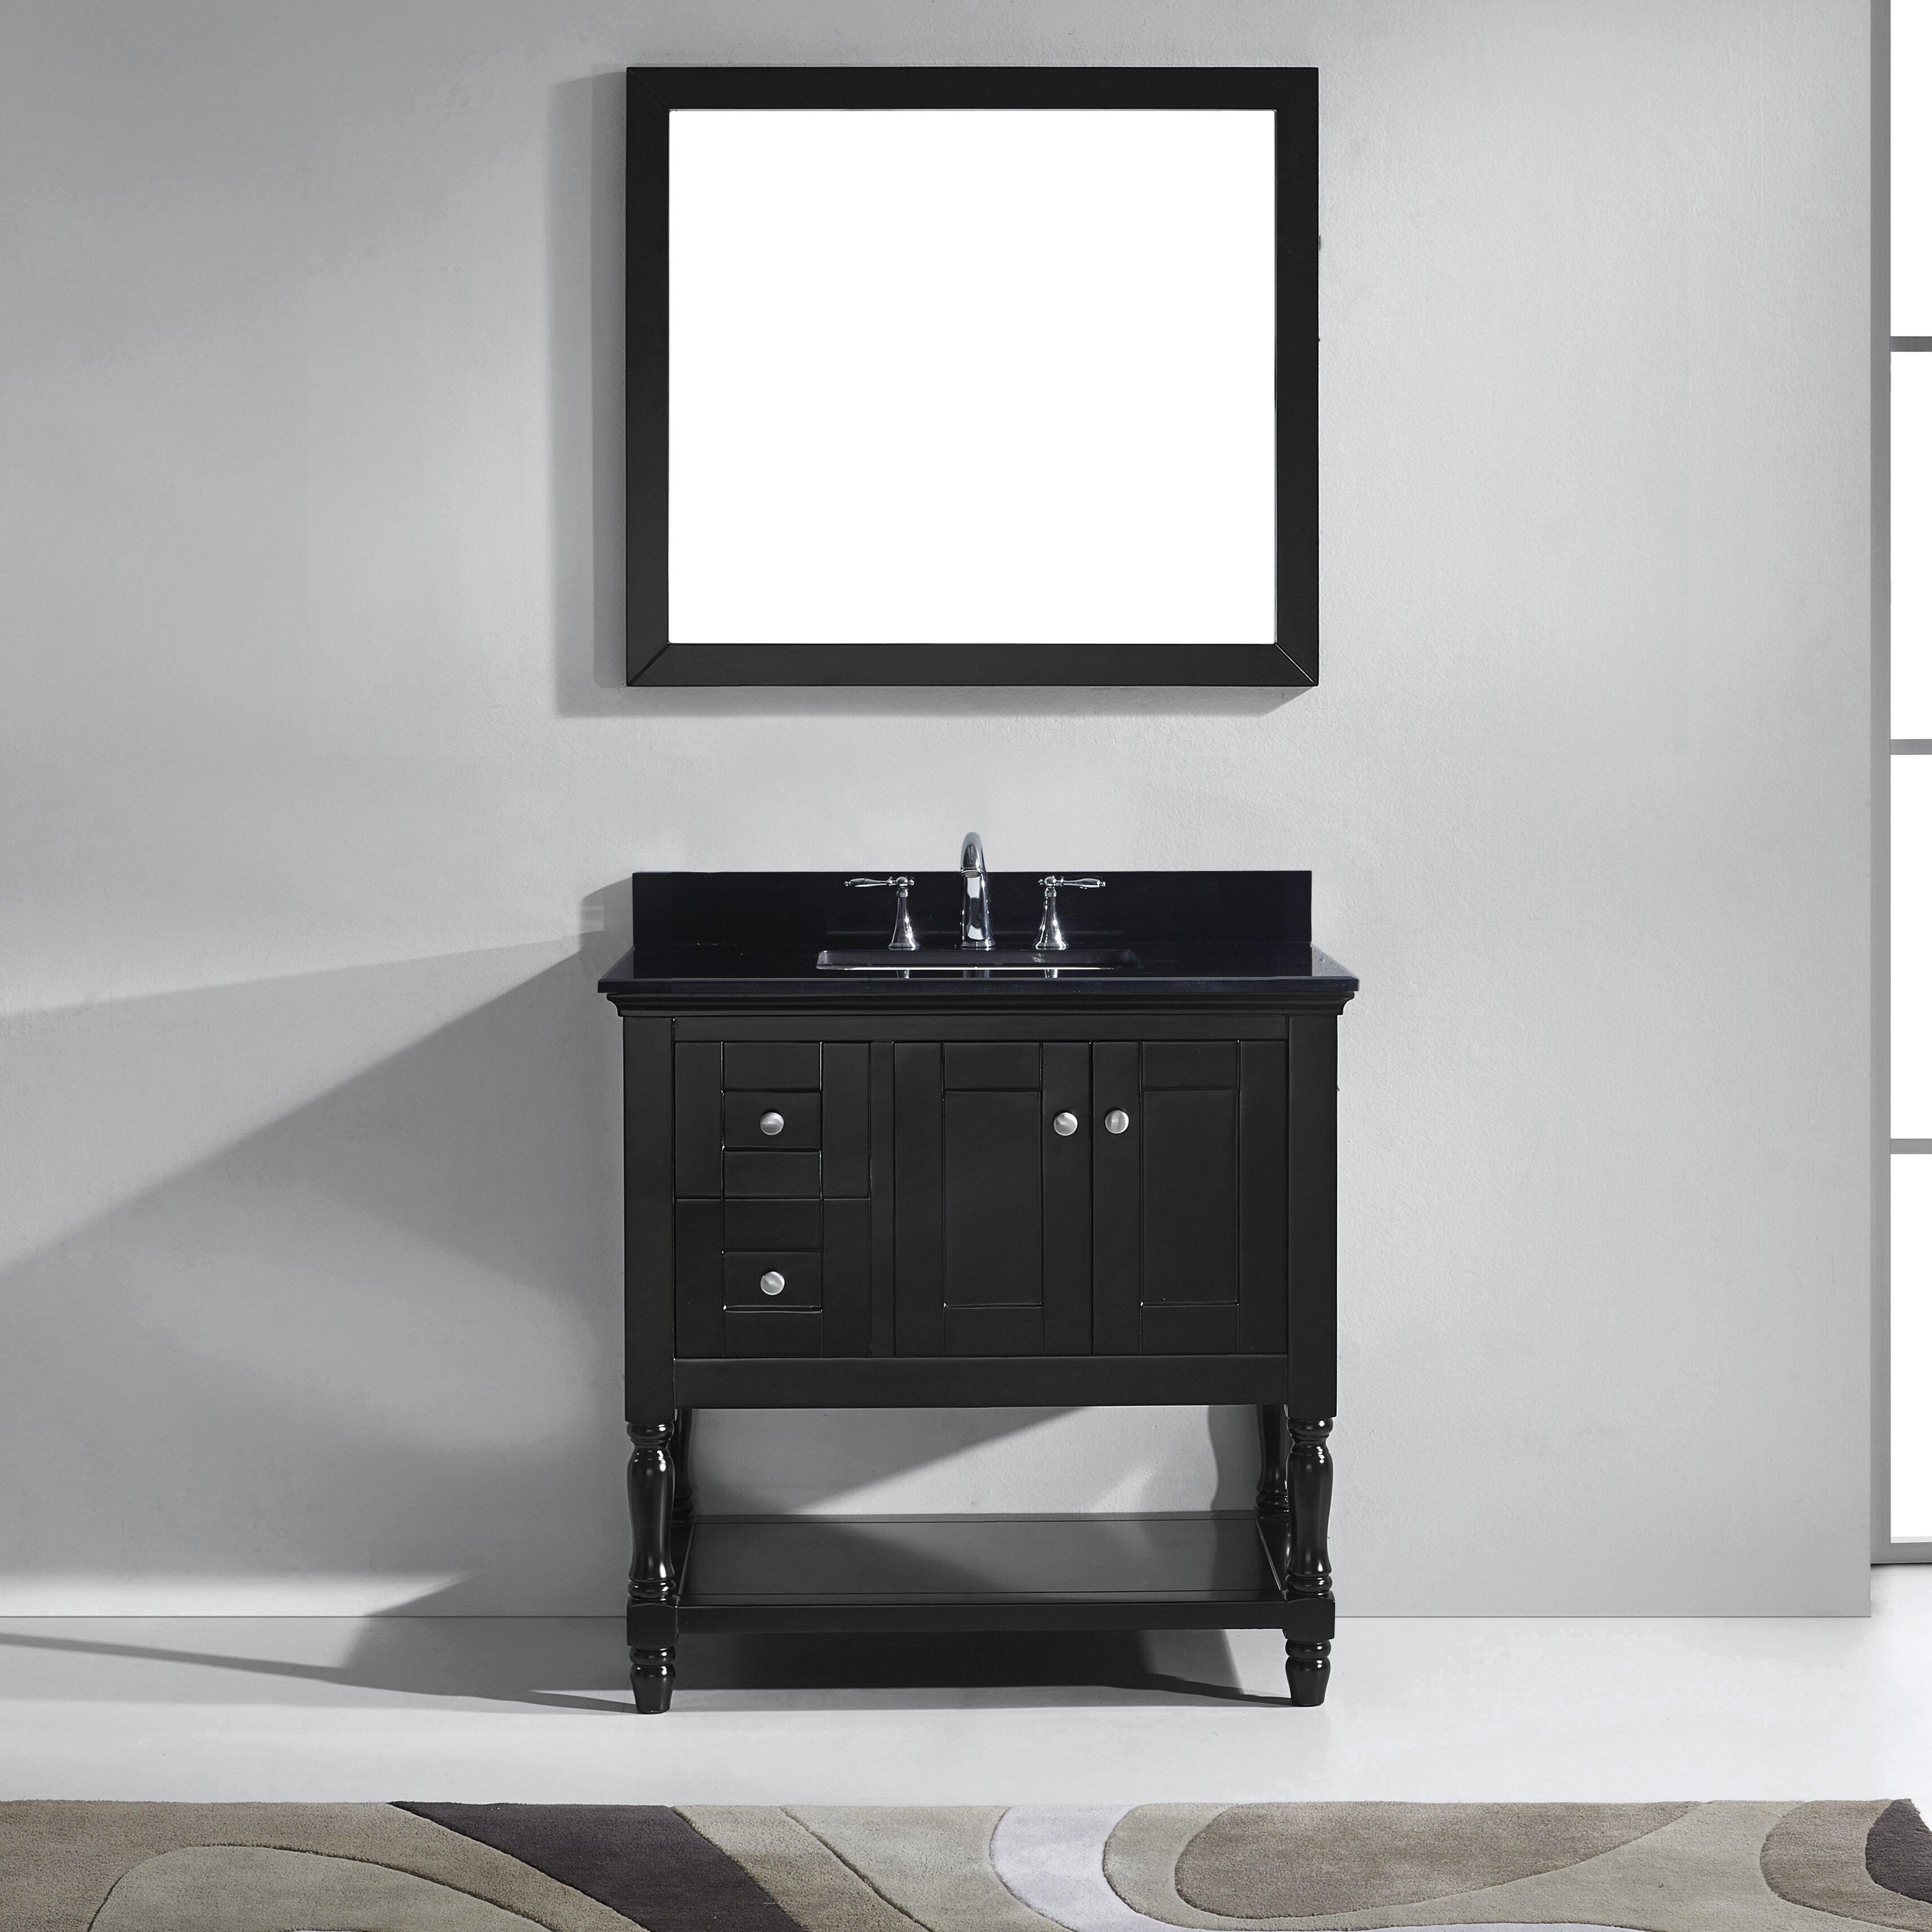 virtu julianna 36 single bathroom vanity set with black galaxy top